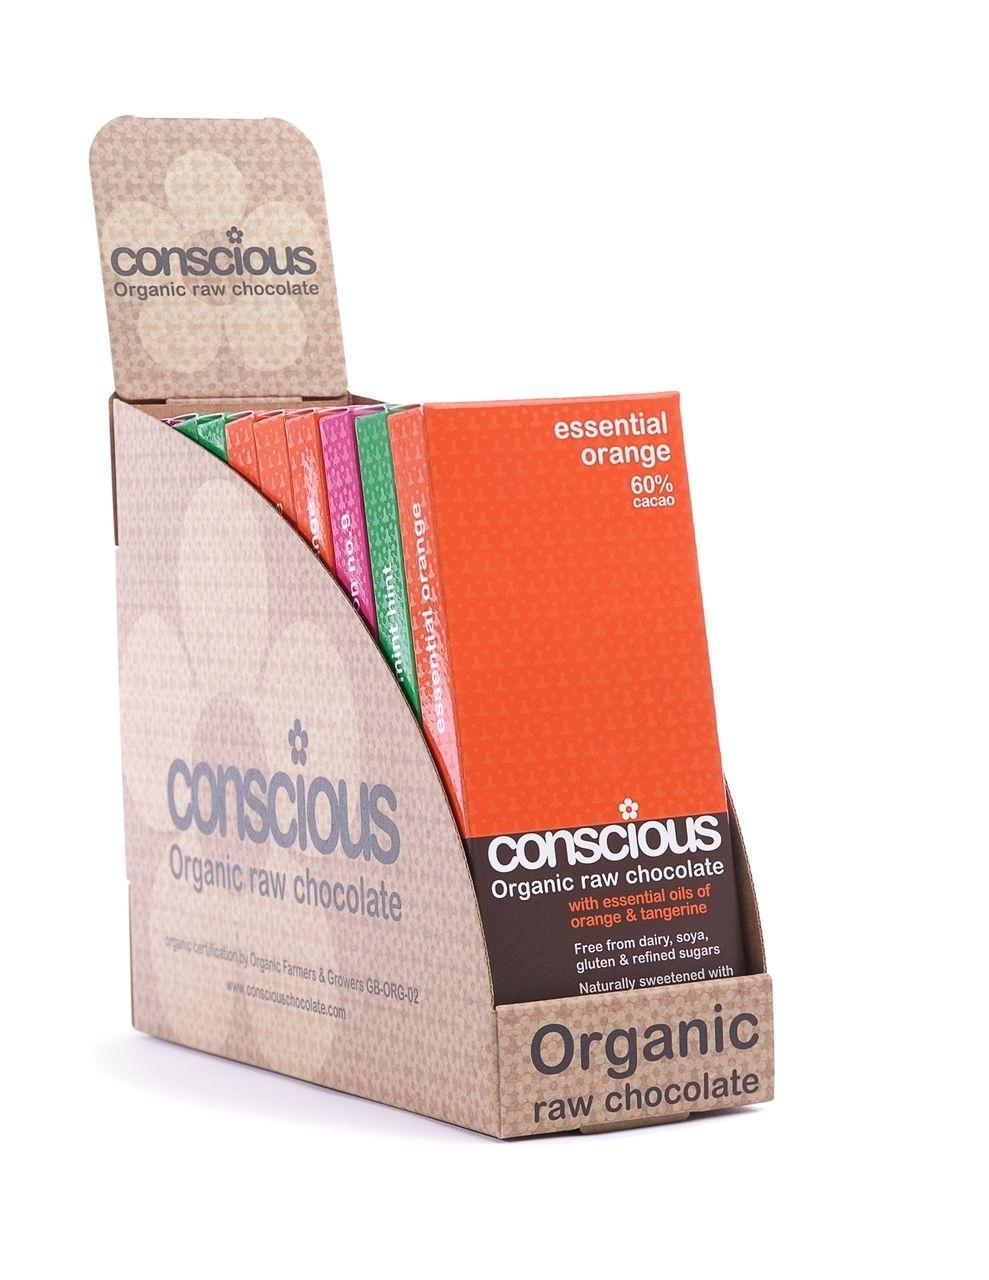 Essential Mixed Box Of 10 Vegan Raw Organic Chocolate 50g Conscious Chocolate Bars Organic Bar Organic Chocolate Chocolate